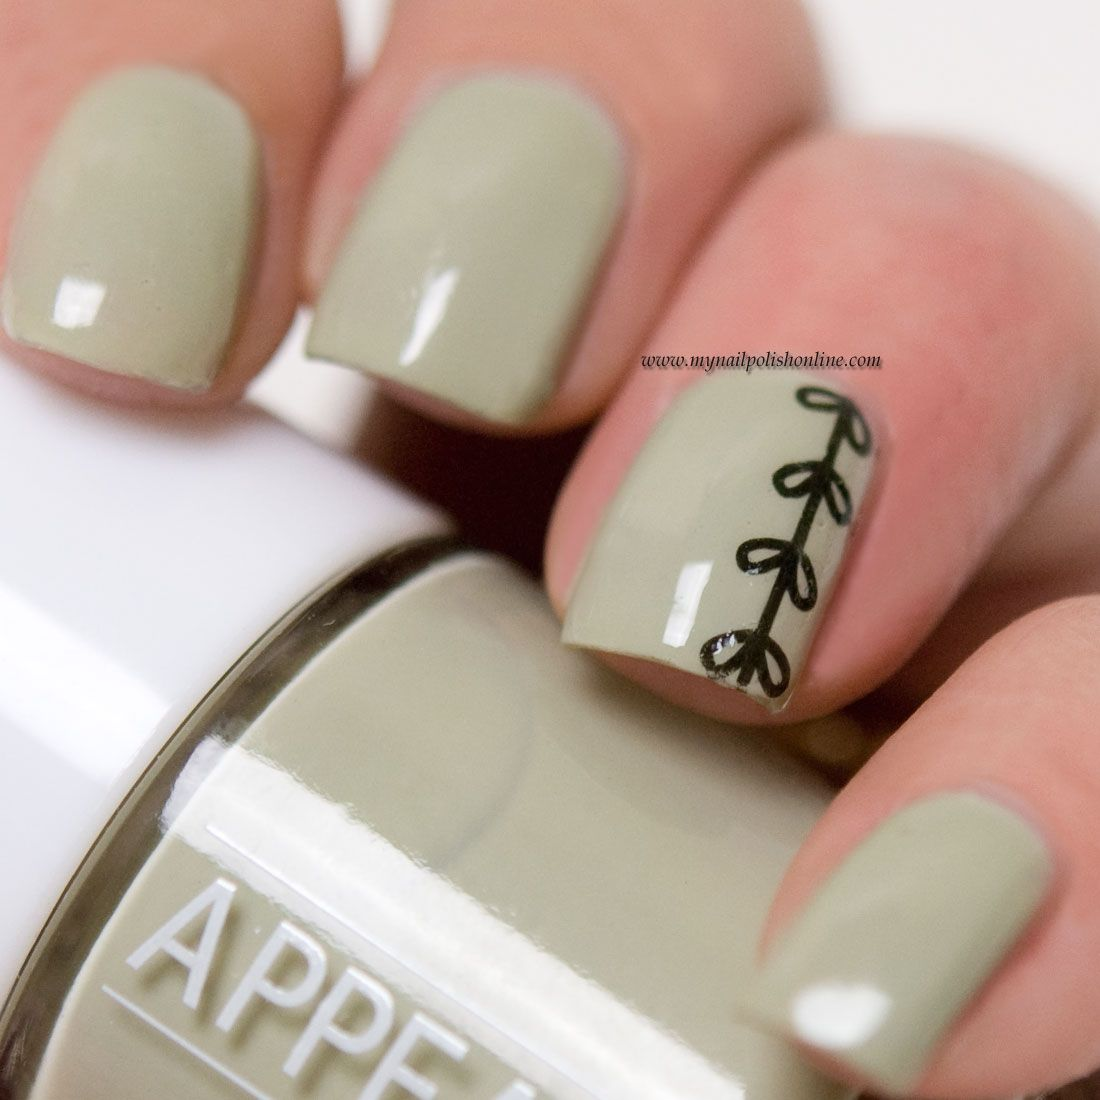 Subtle Nail Art With Hand Tattoos Nail Art Pinterest Subtle